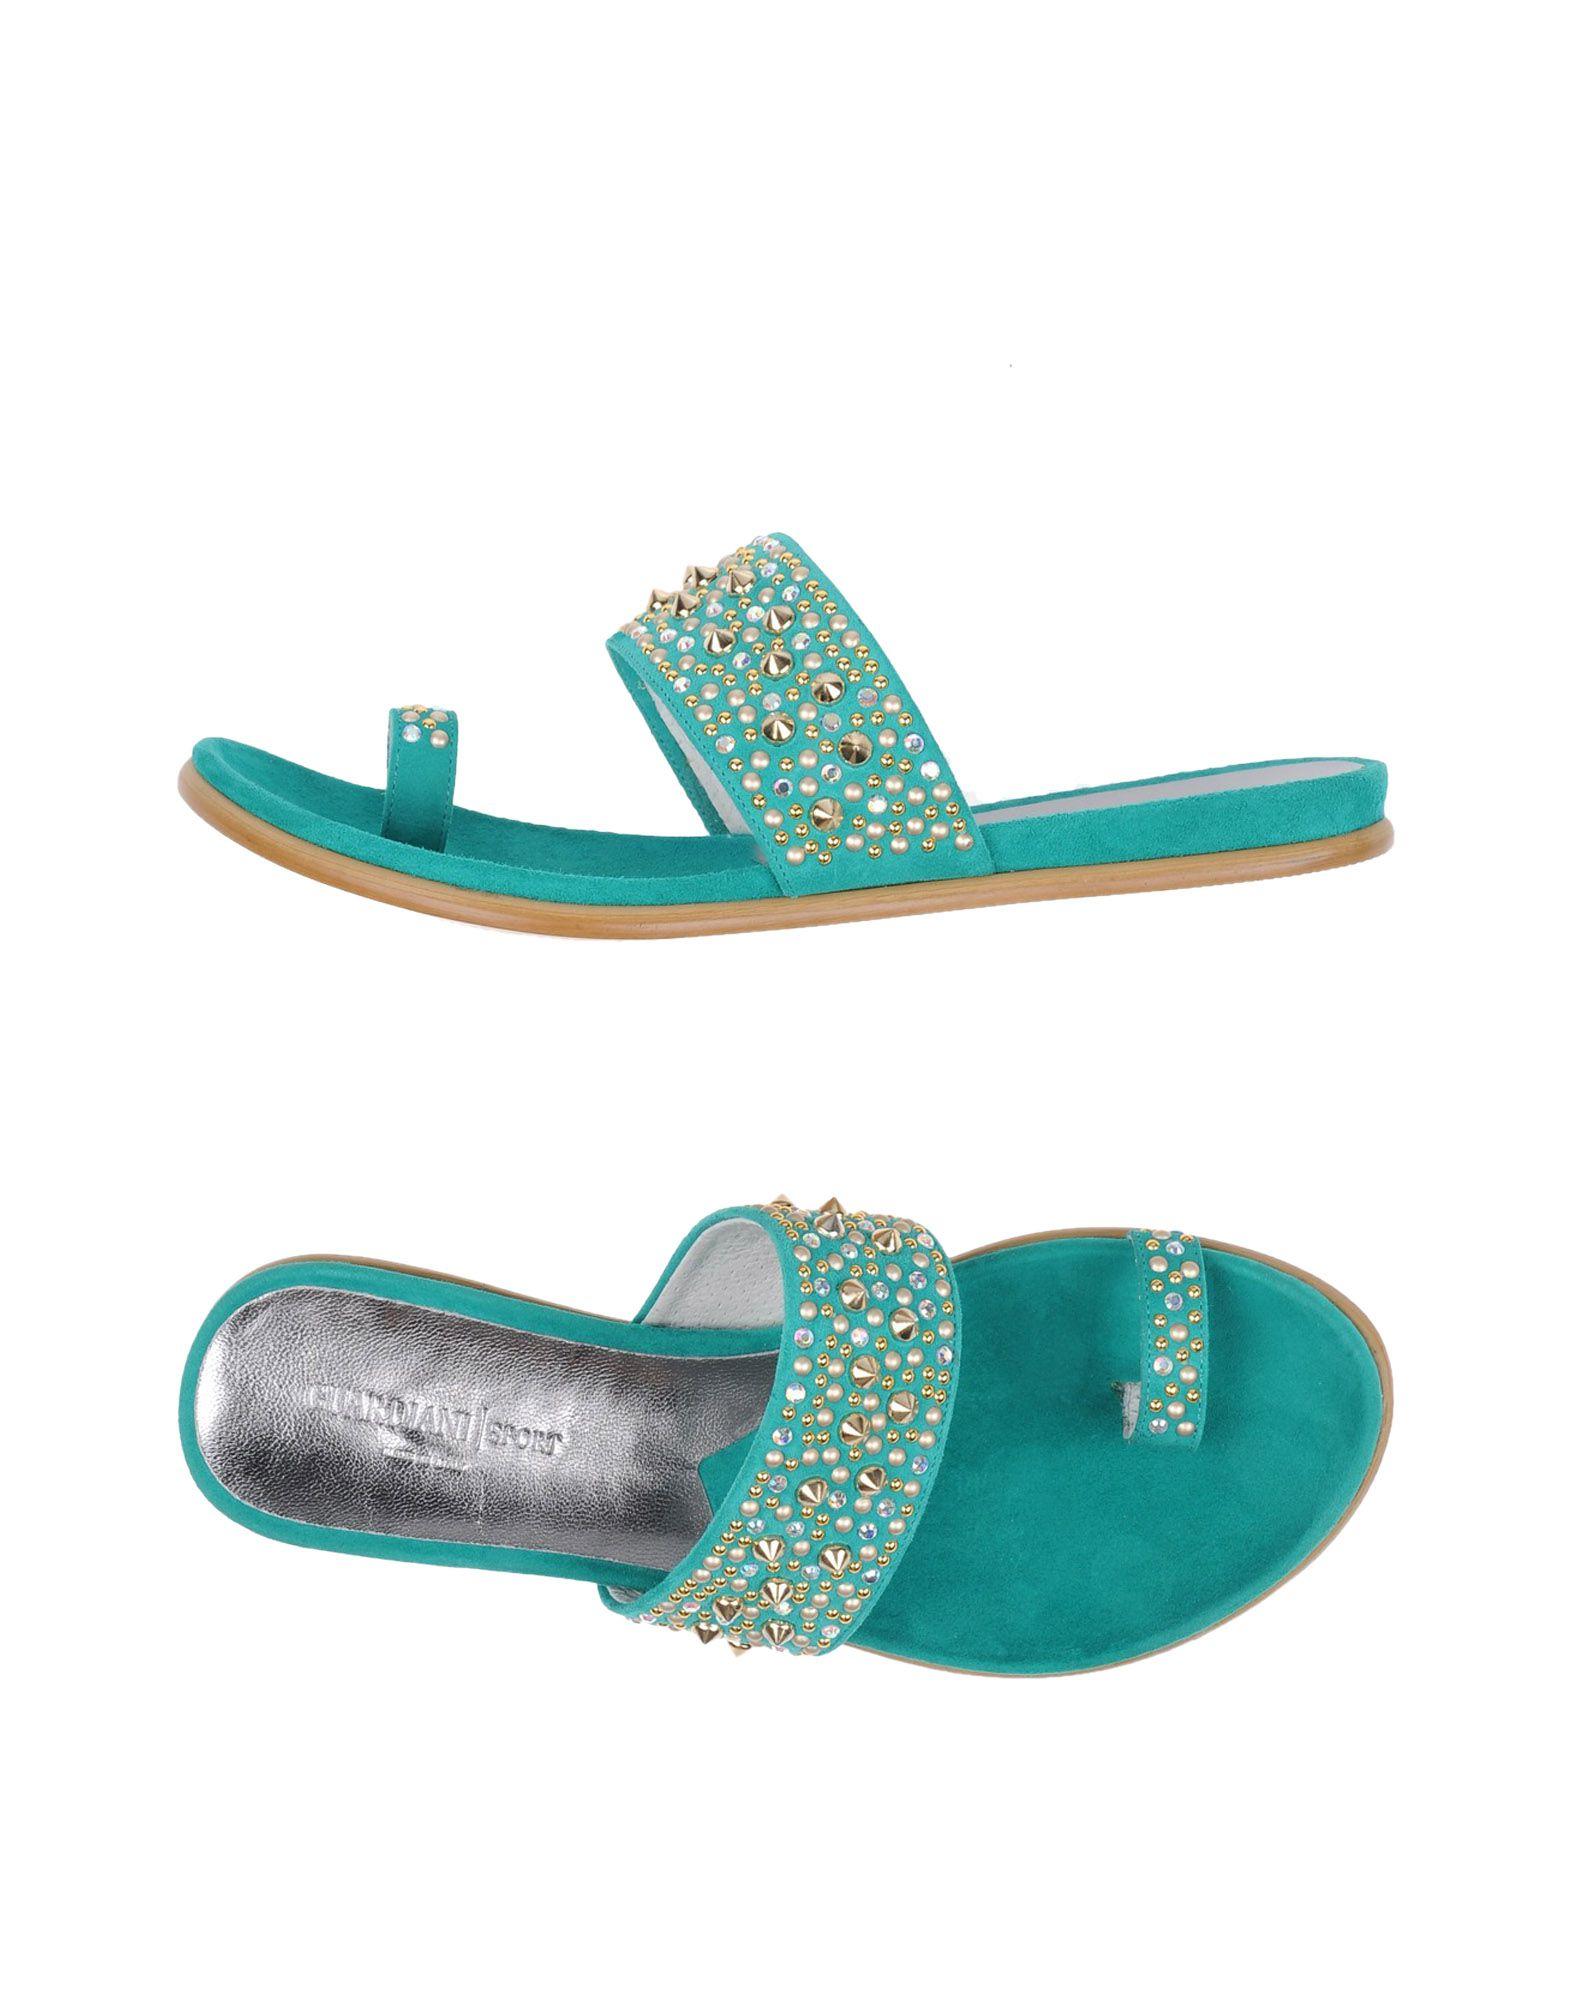 Alberto Guardiani Dianetten Damen  11254948LK Gute Qualität beliebte Schuhe